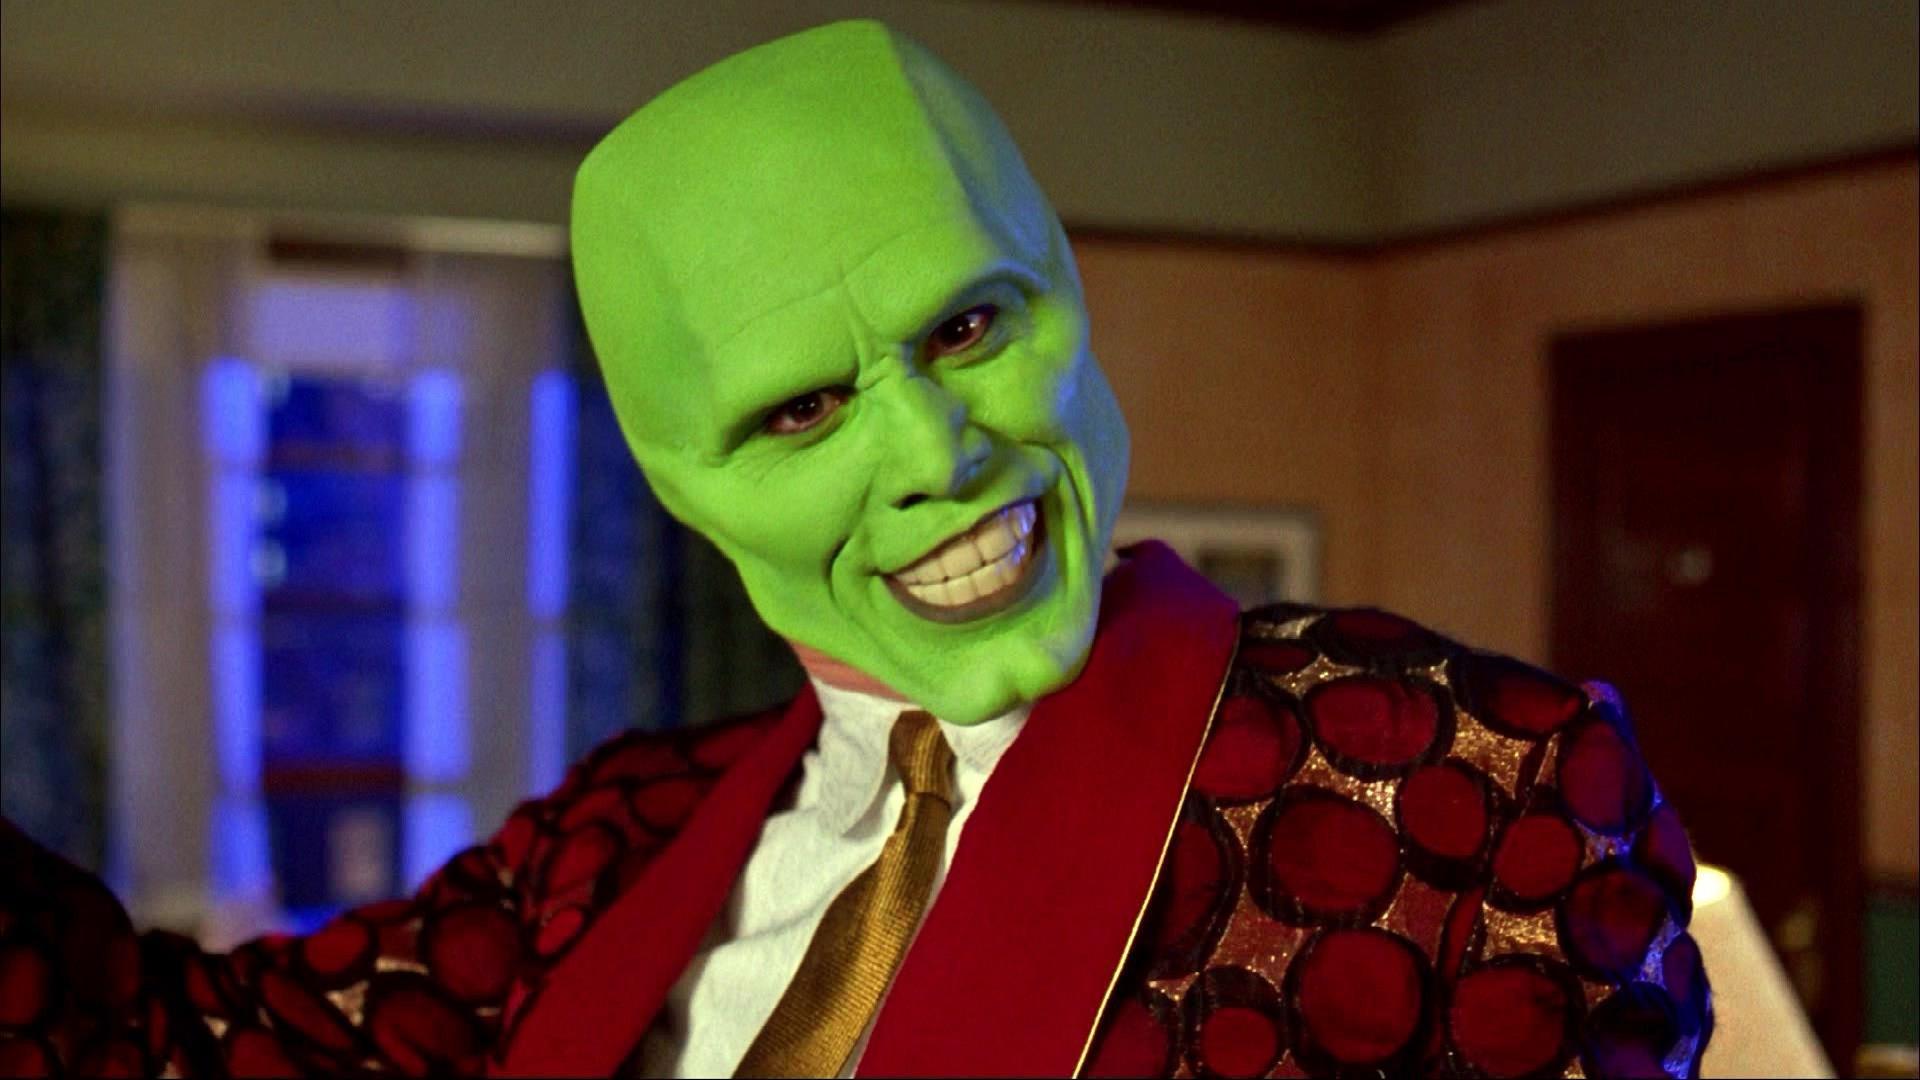 Jim Carrey as The Mask (1994)